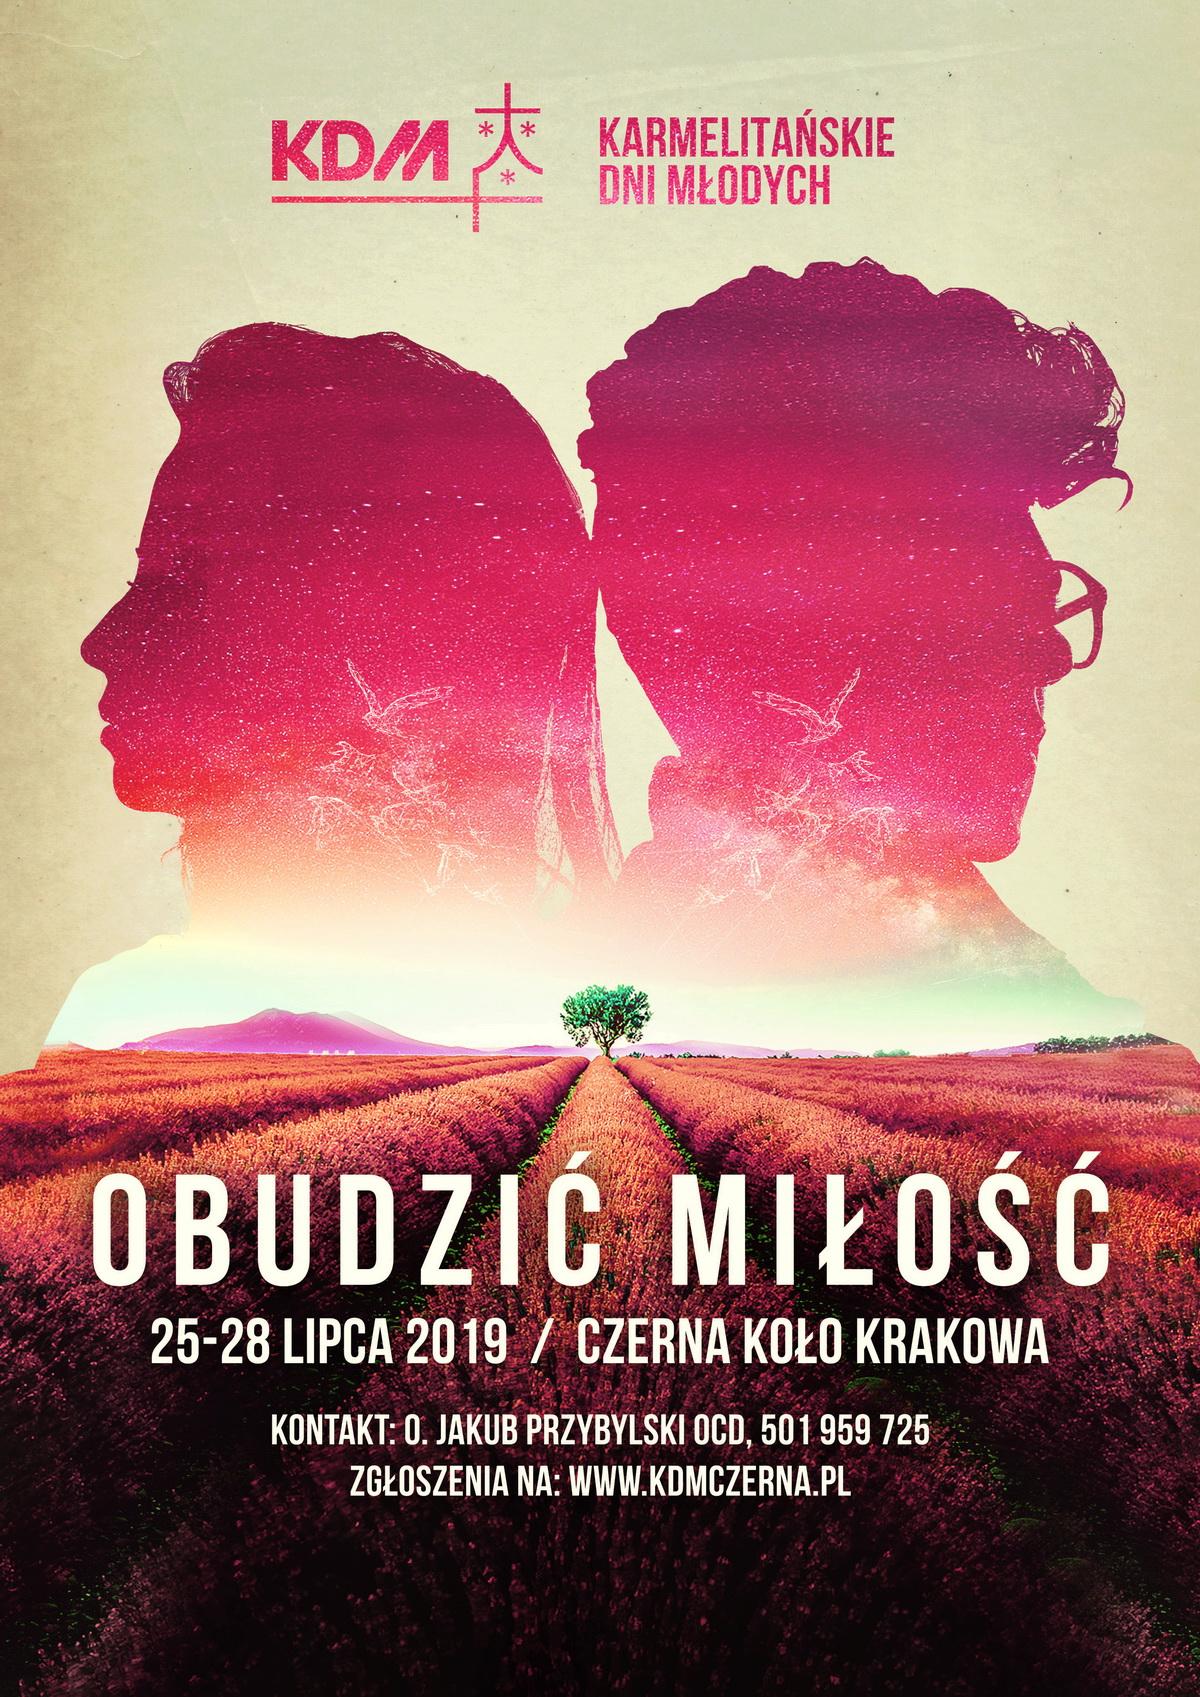 Plakat KDM 2019